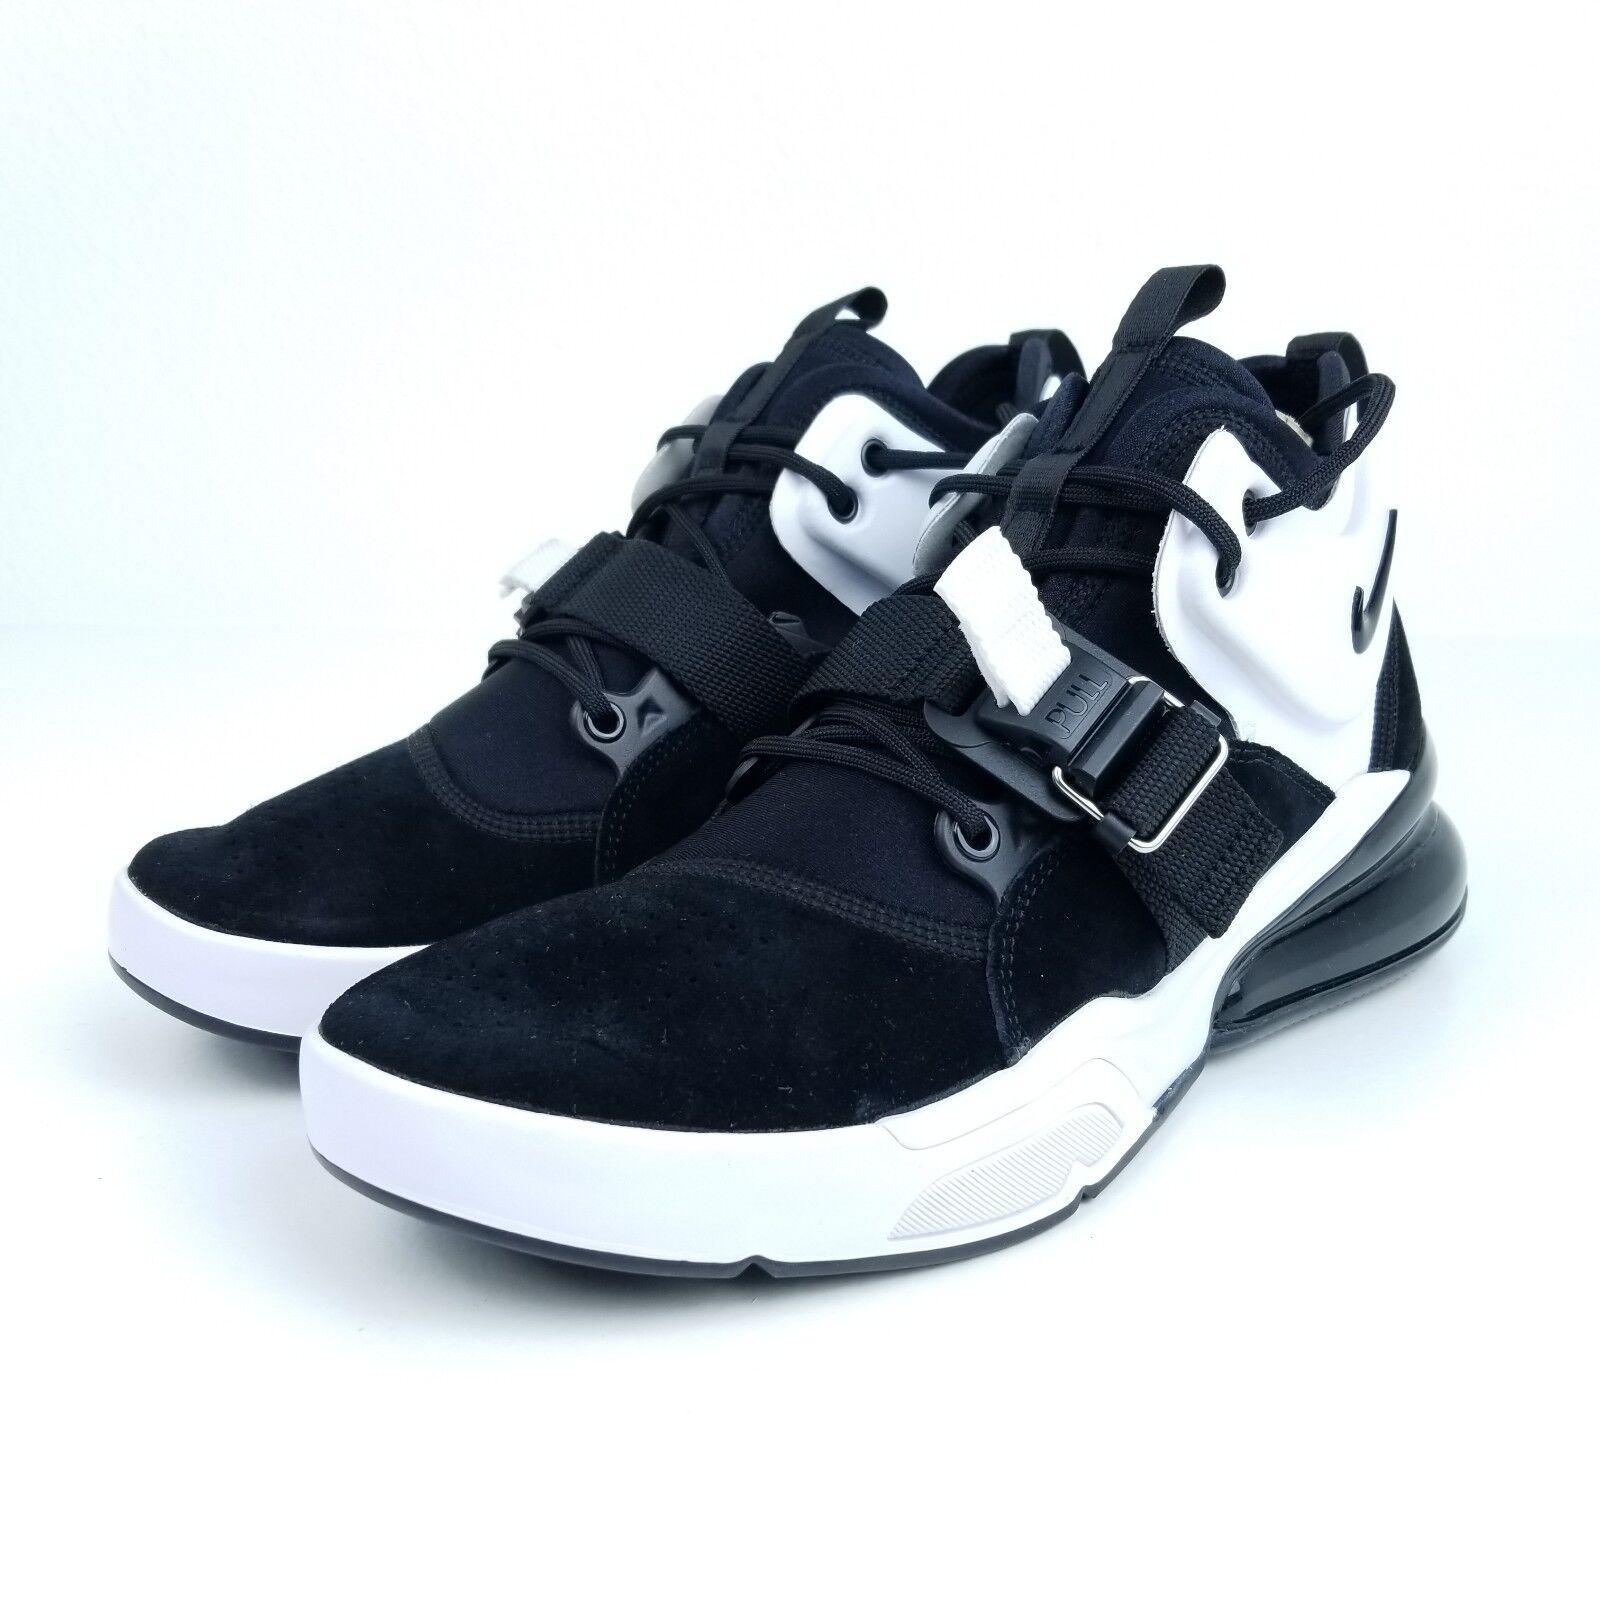 Nike Air Force 270 Black Metallic Silver White AH6772 006 Mens Sneaker Size 7-12